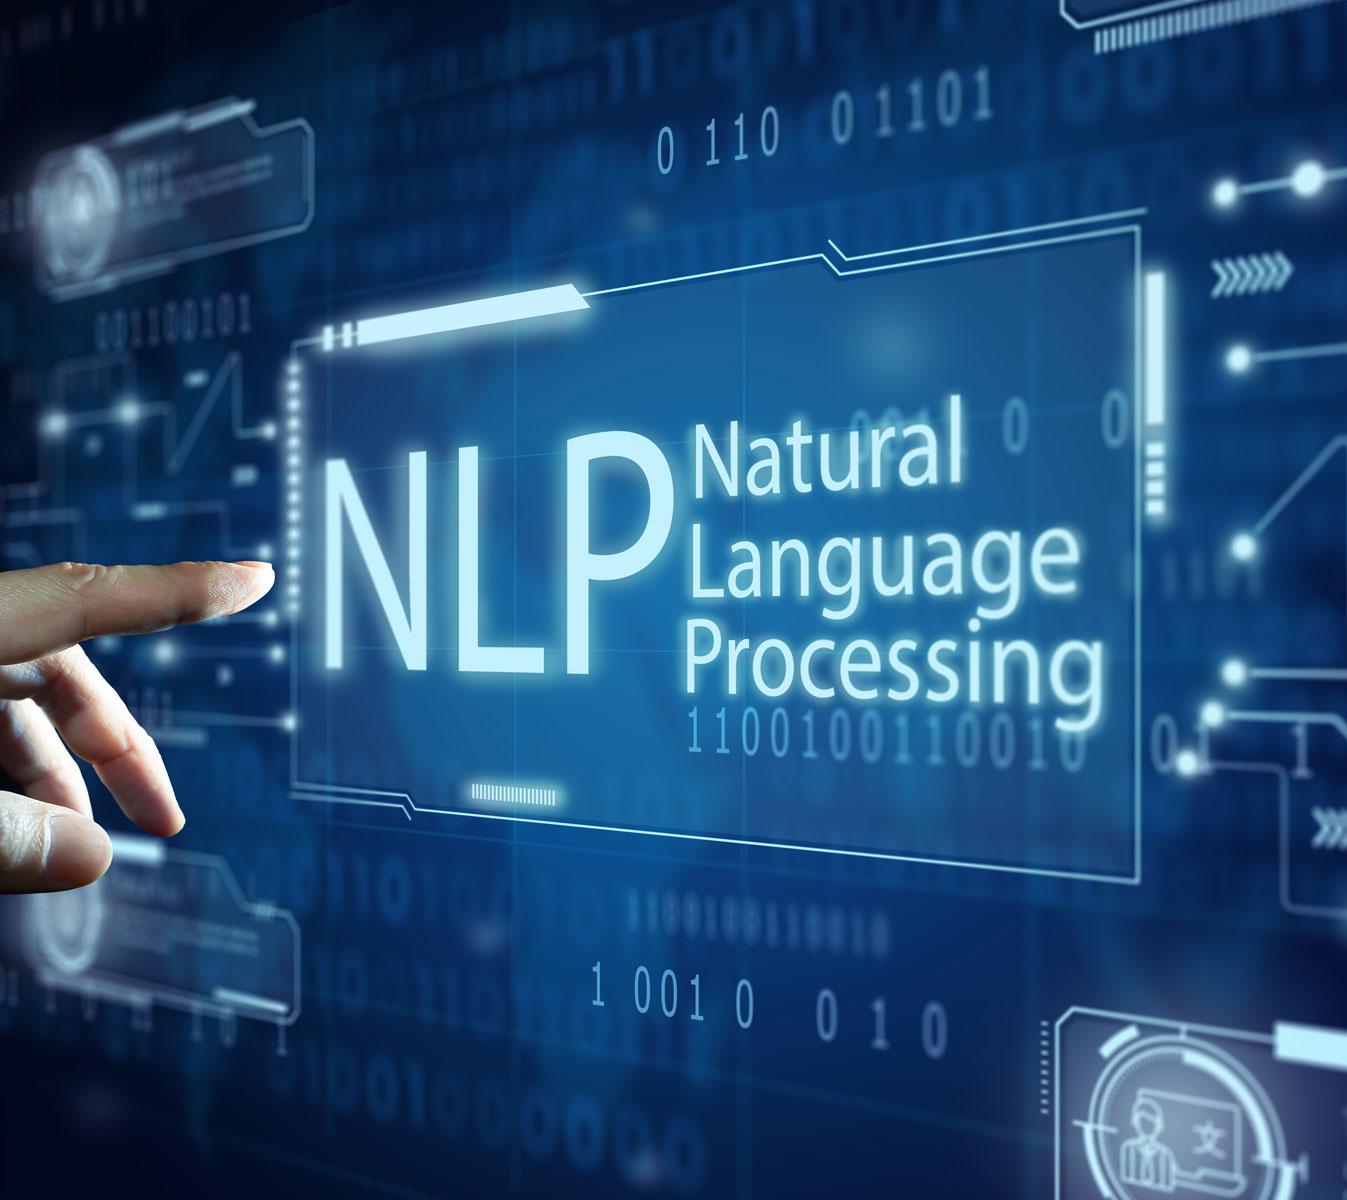 NLP illustration image